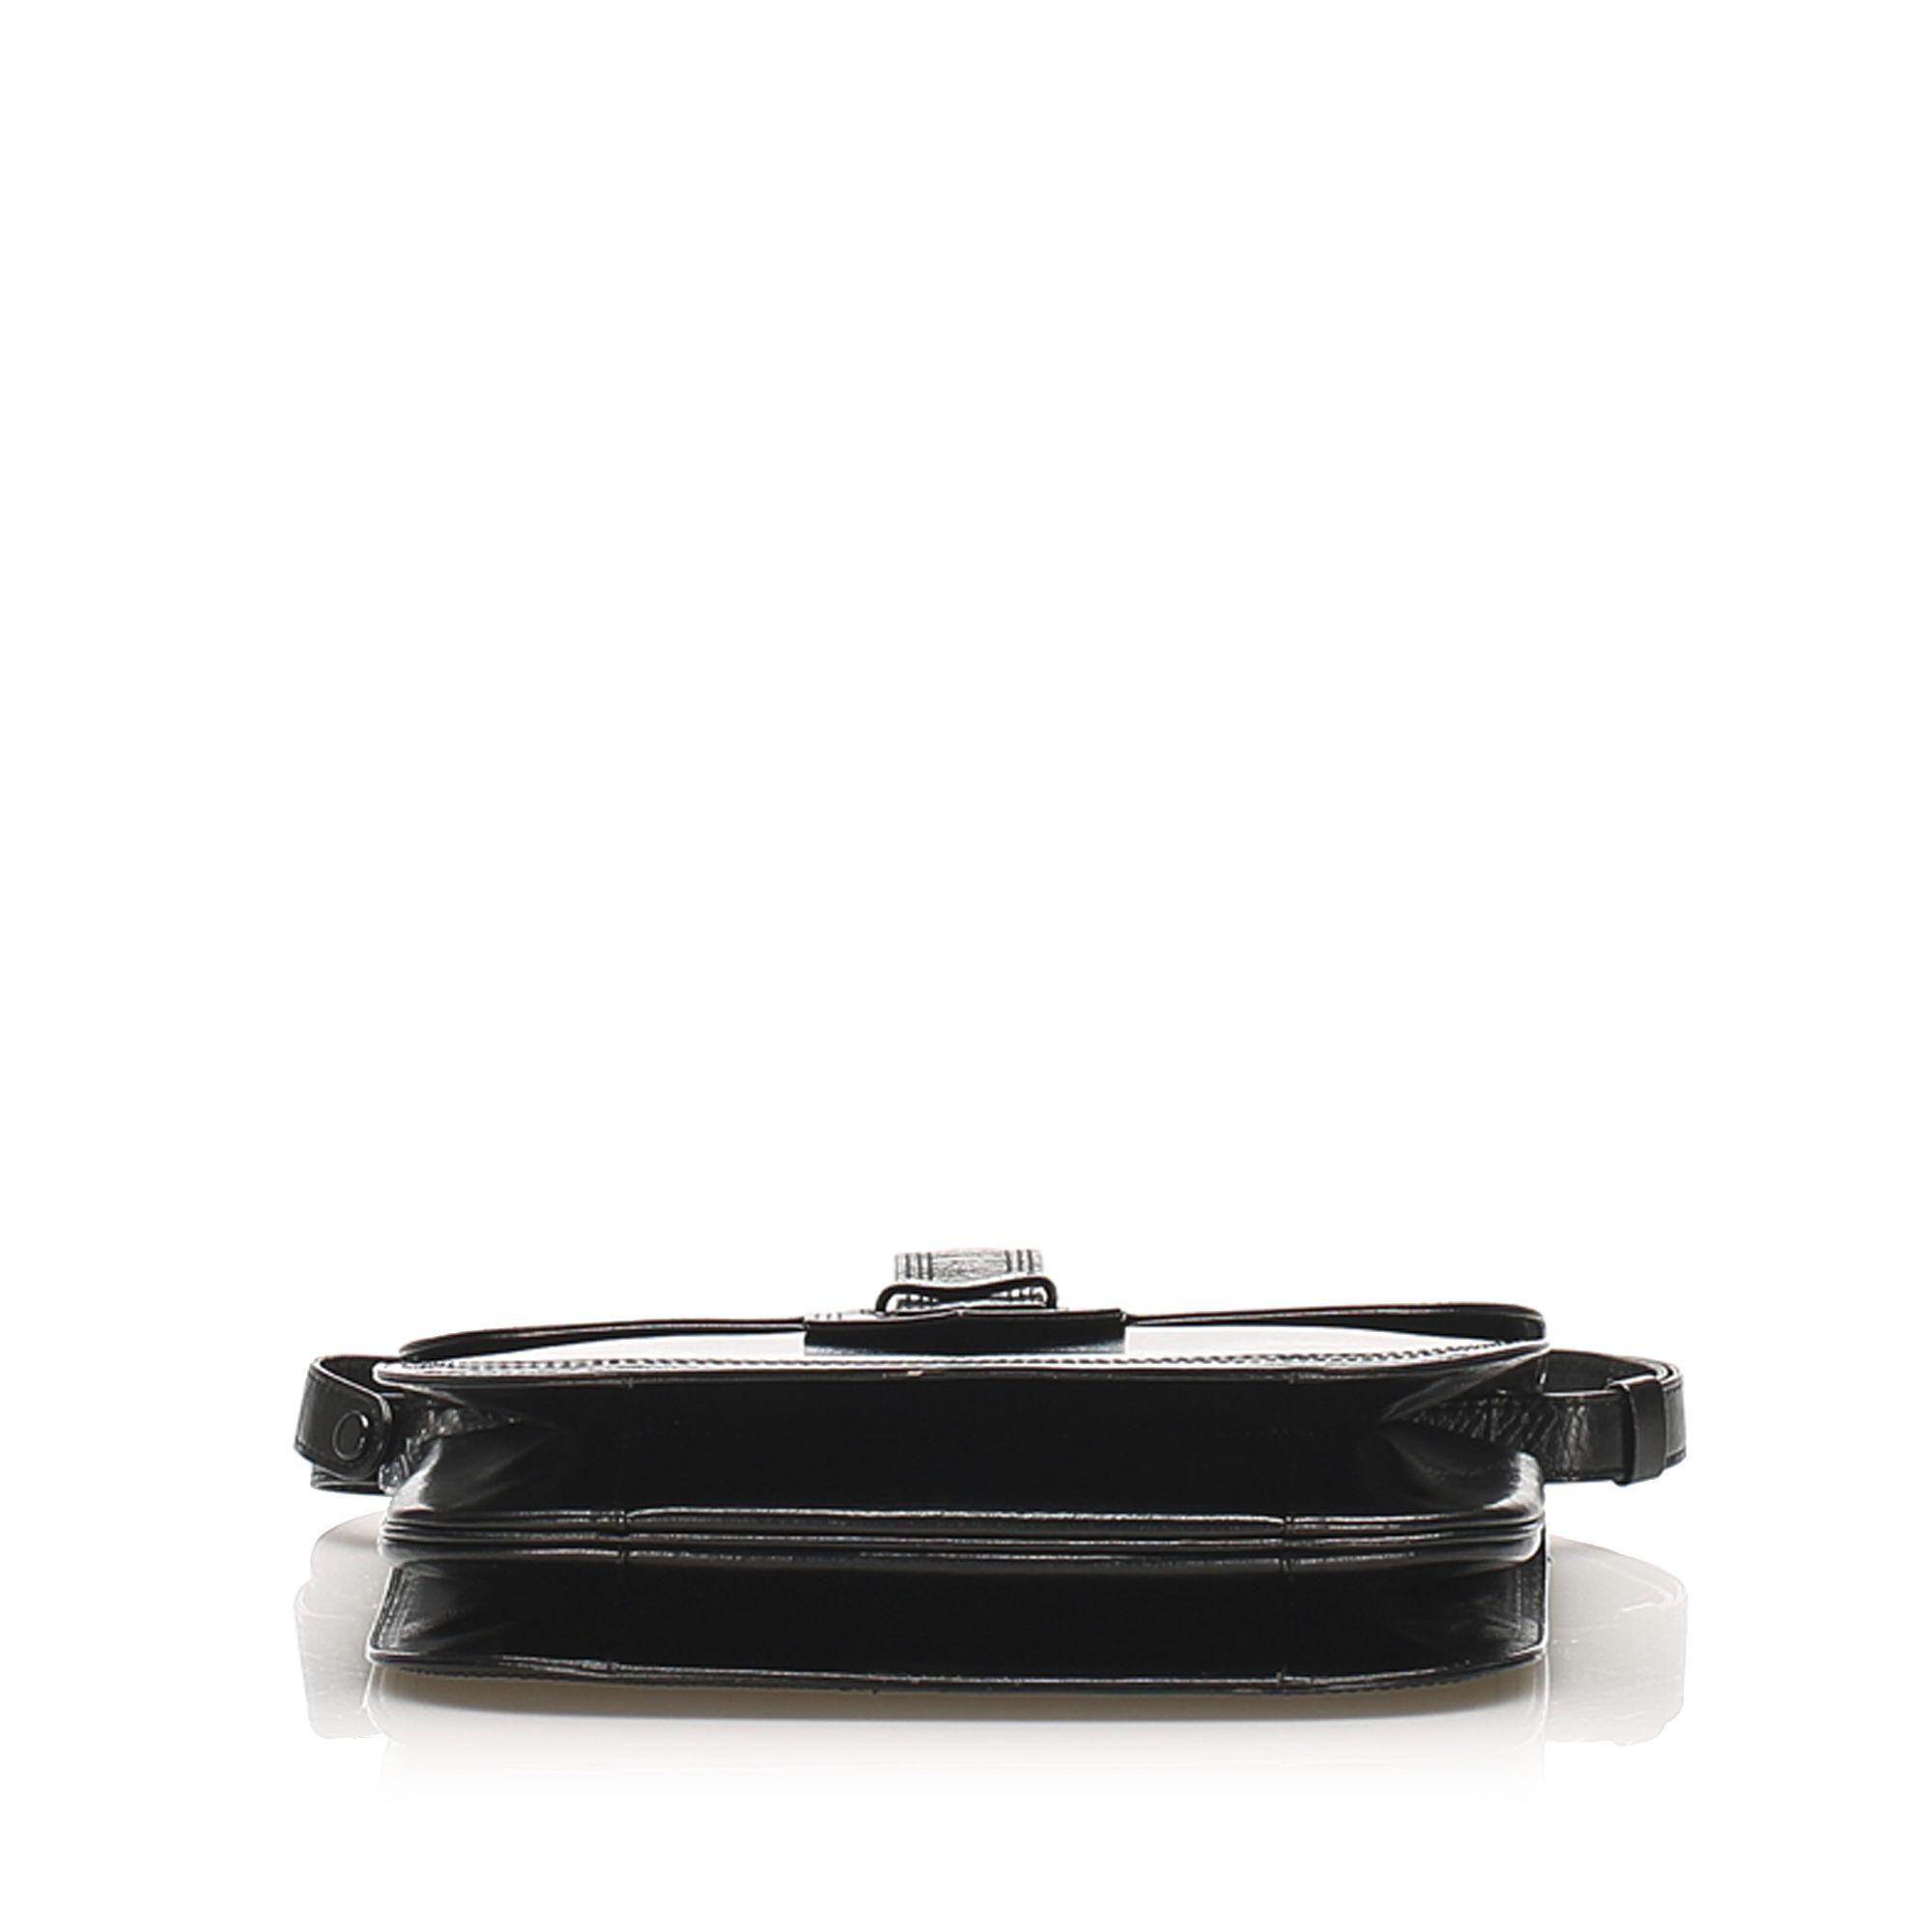 Vintage YSL Leather Handbag Black